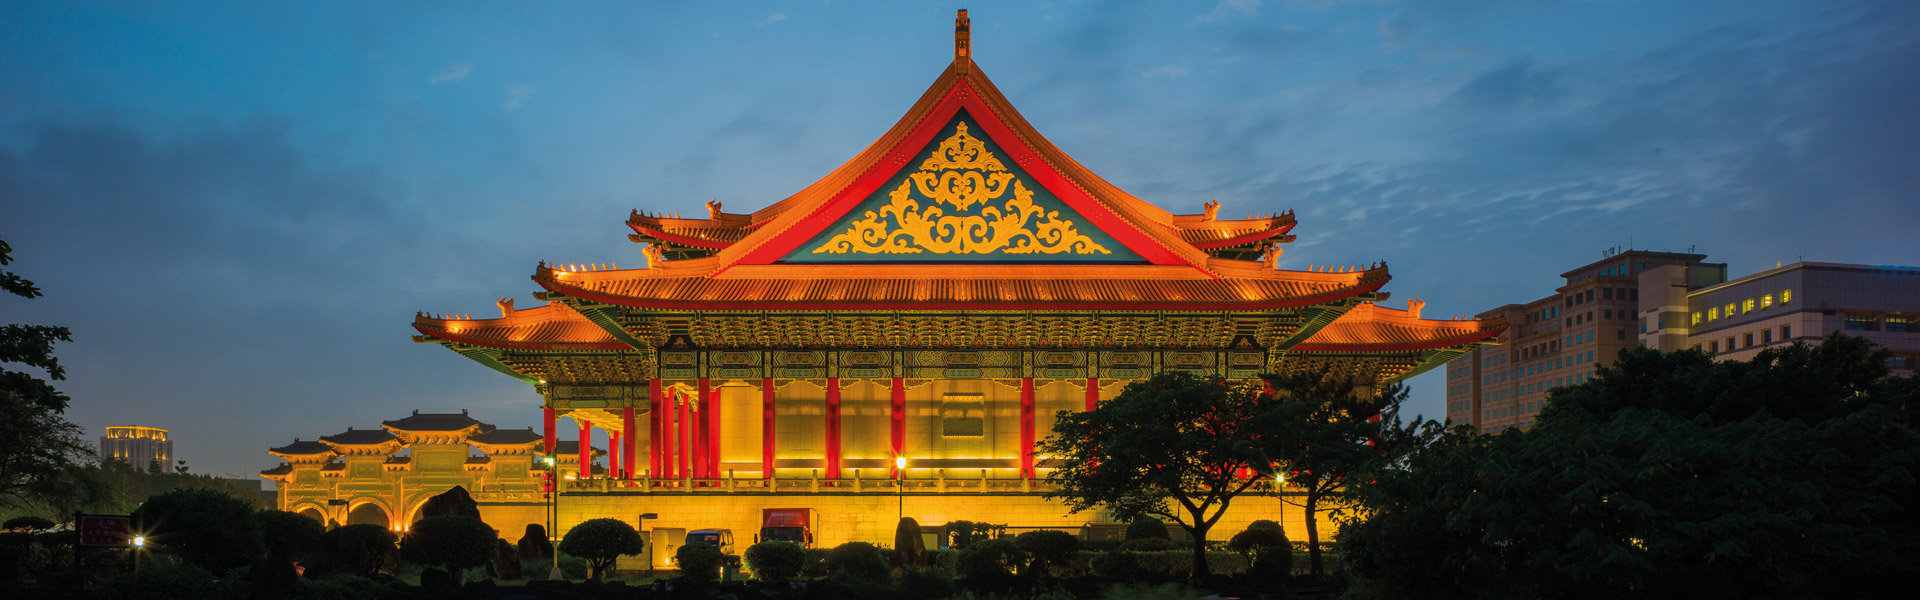 concert hall taipei